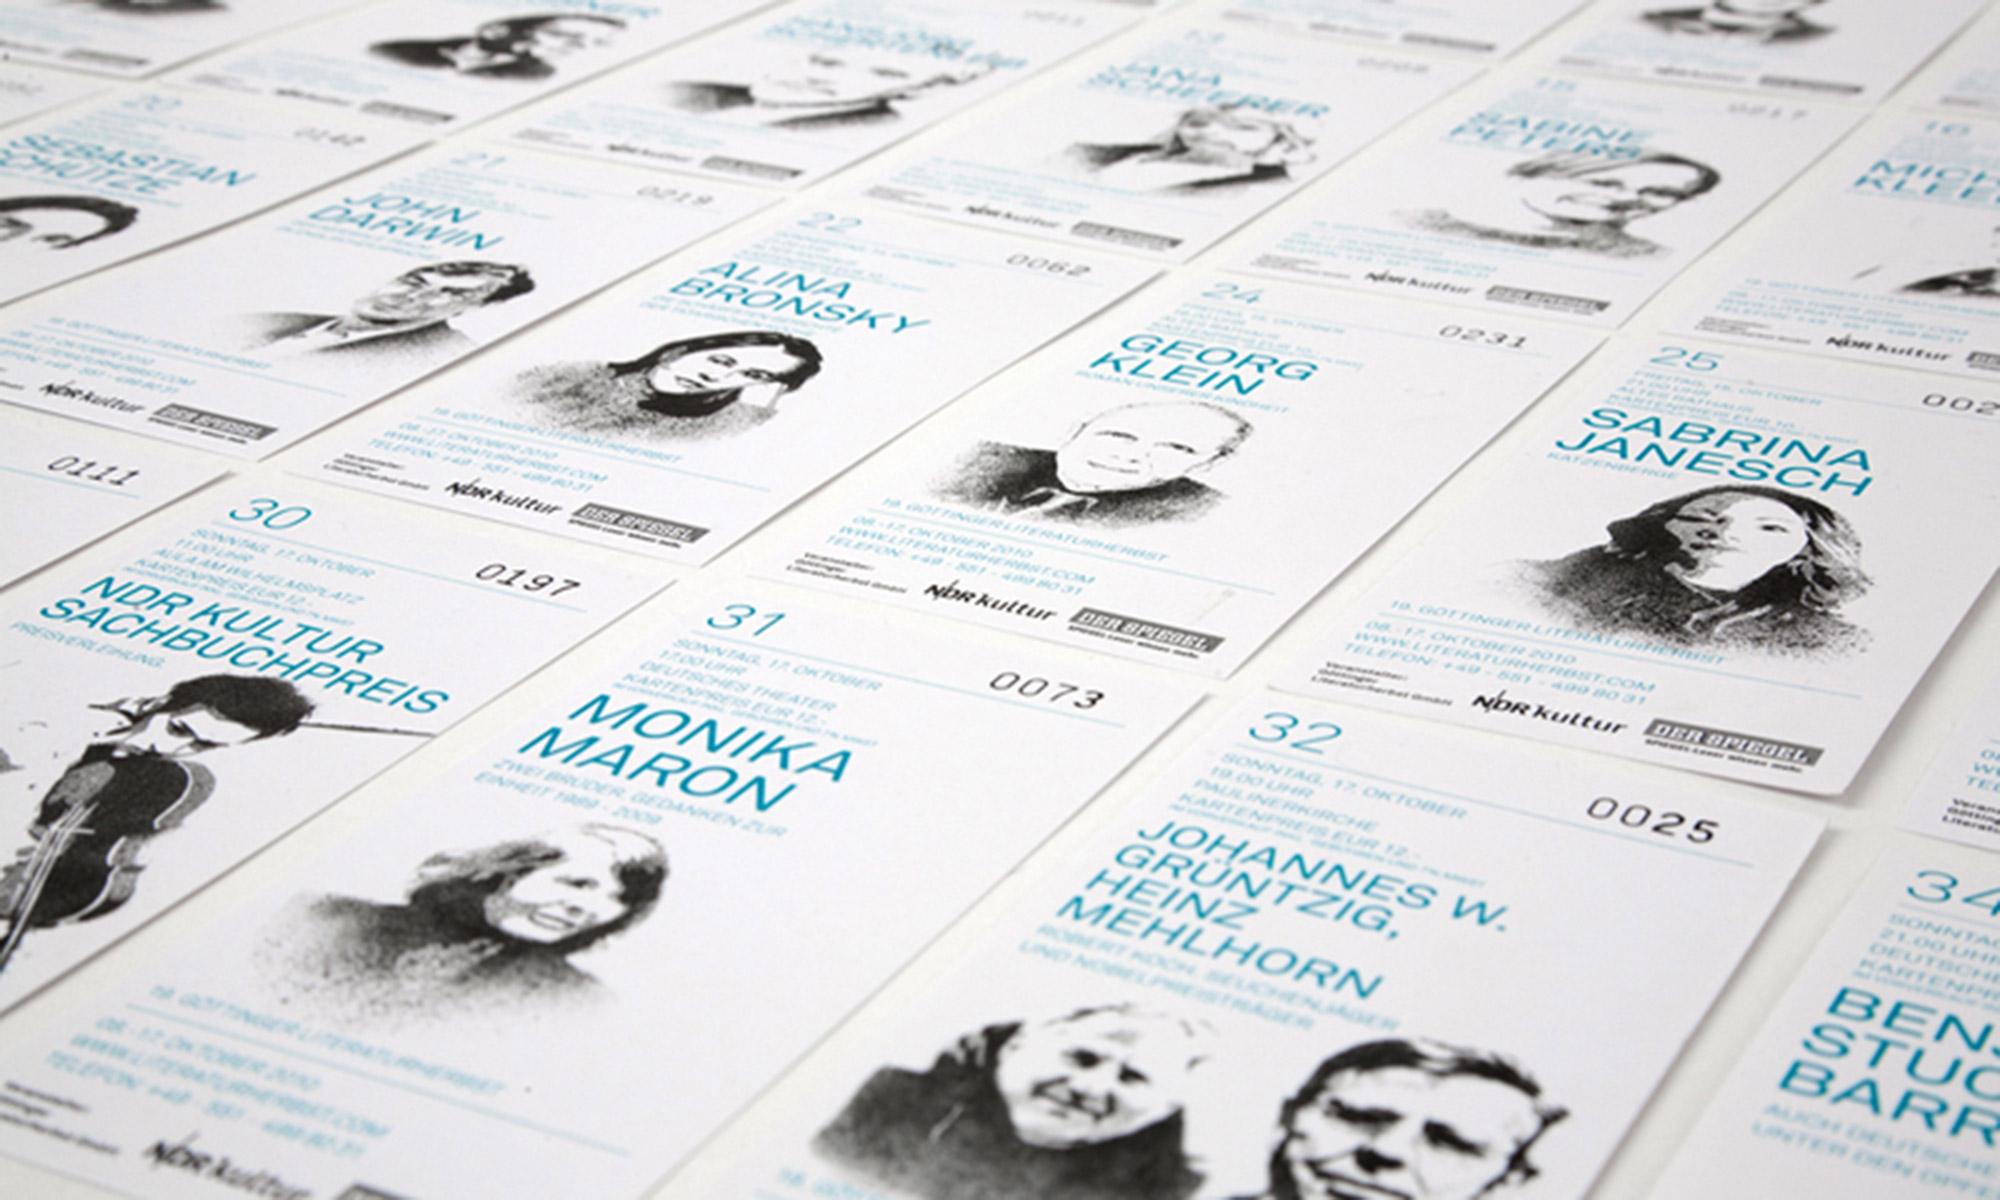 Göttinger Literaturherbst 2010 Branding